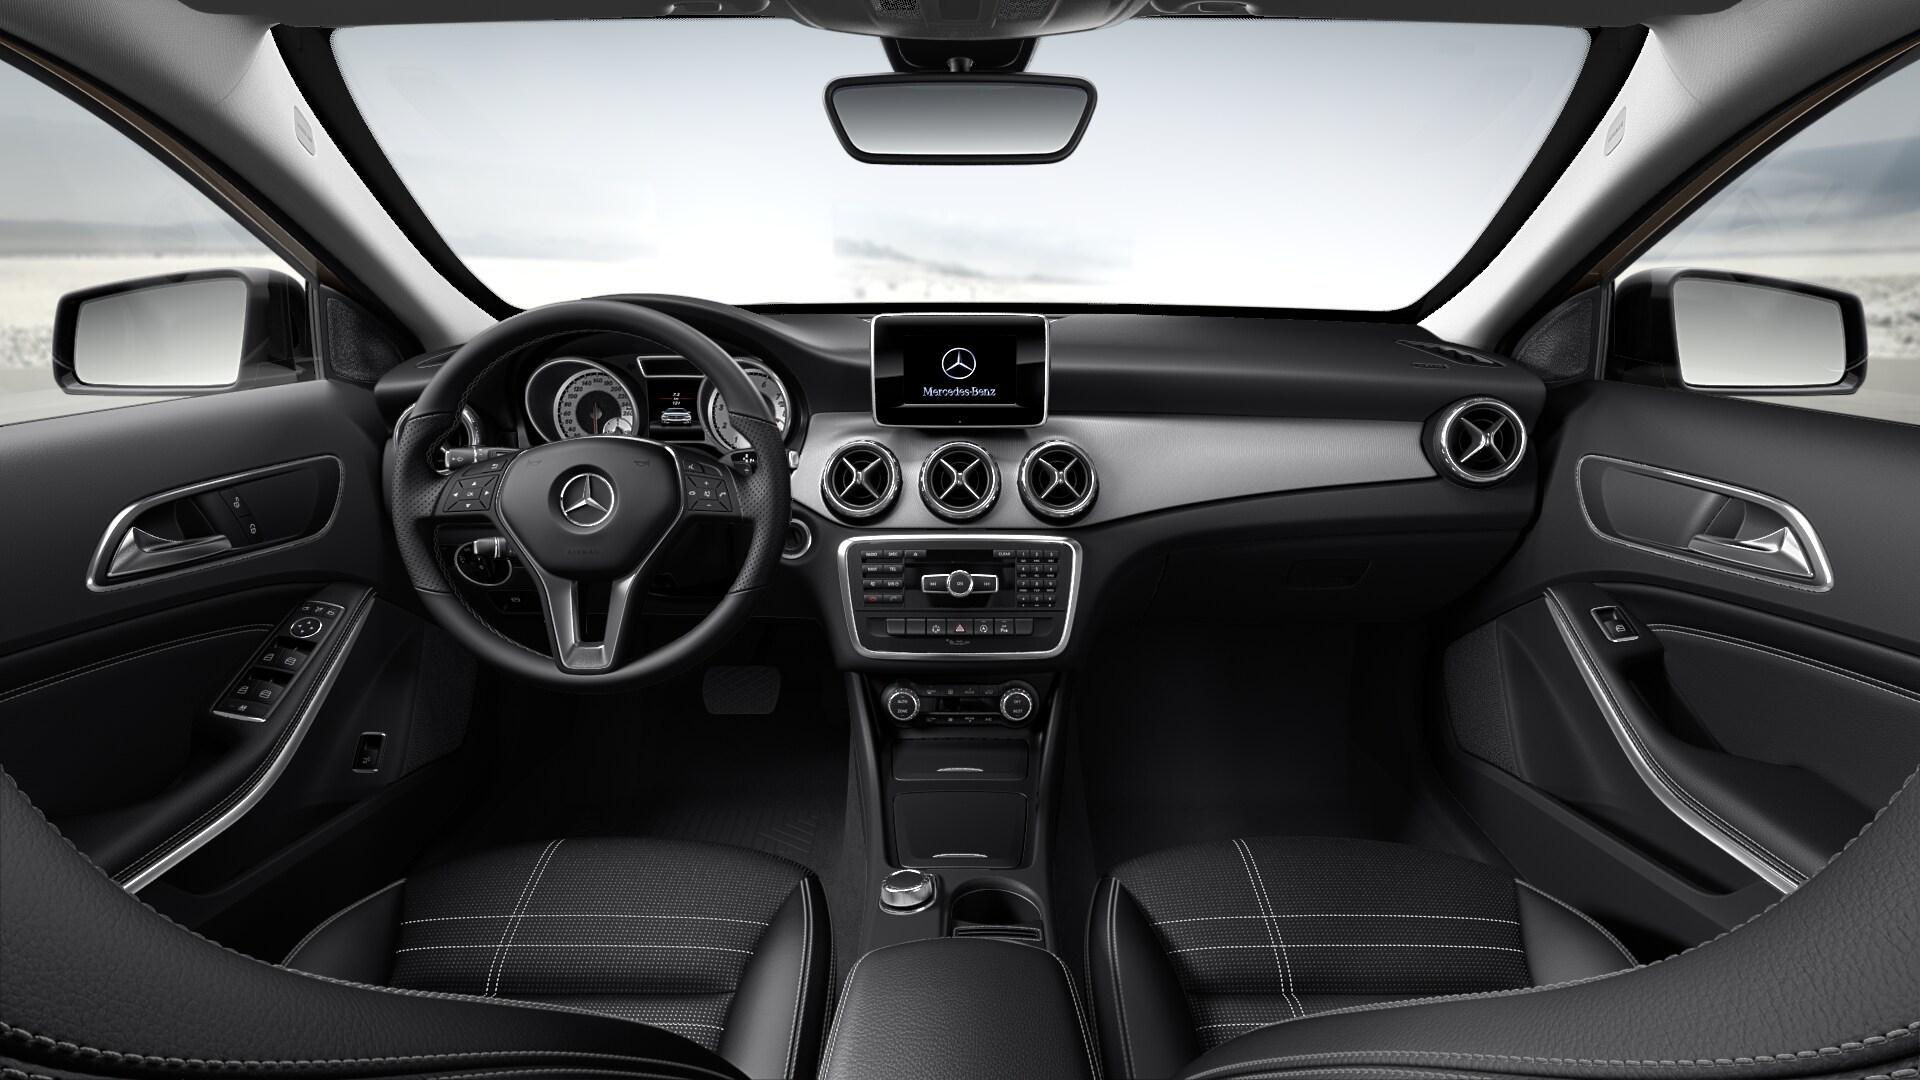 Veloster 2015 Turbo in addition Mercedes Benz Gla 1 5 Dizel Crossover Suv Karisimi likewise Jaguar Xf additionally Audi S1 as well Photofull. on hyundai sonata turbo